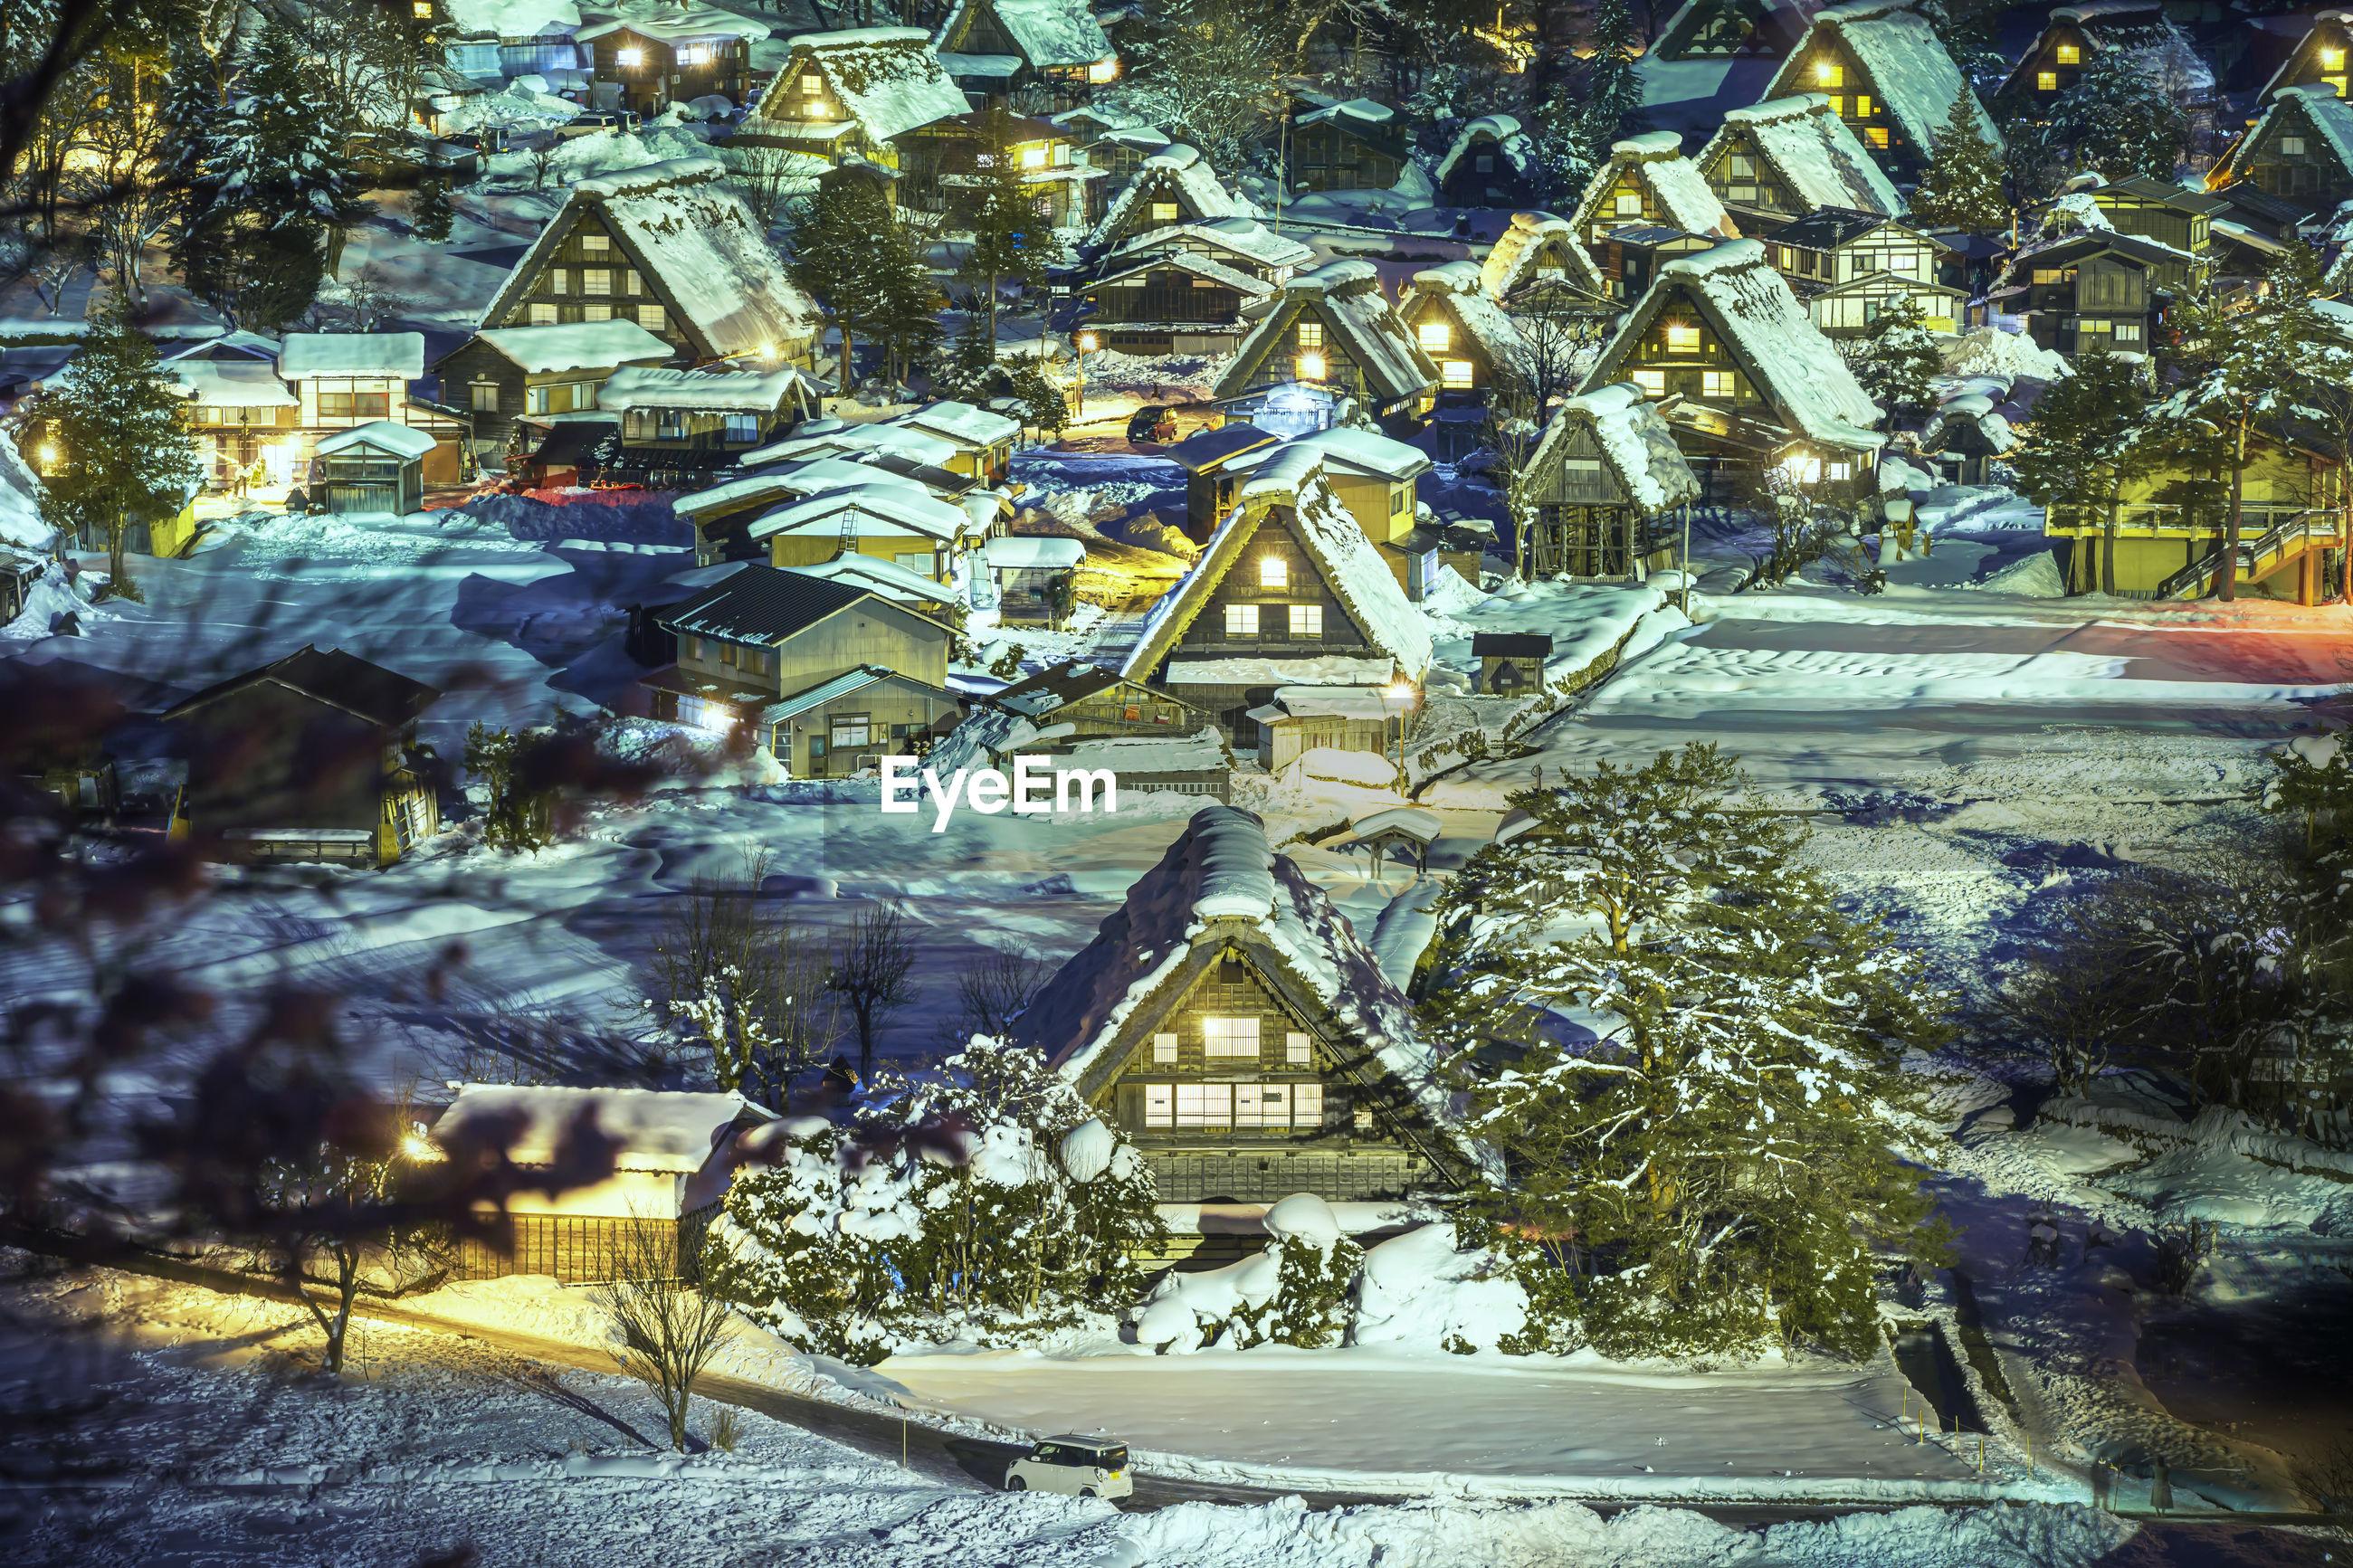 World heritage site shirakawago twightlight. historic village of shirakawago in winter. gifu, japan